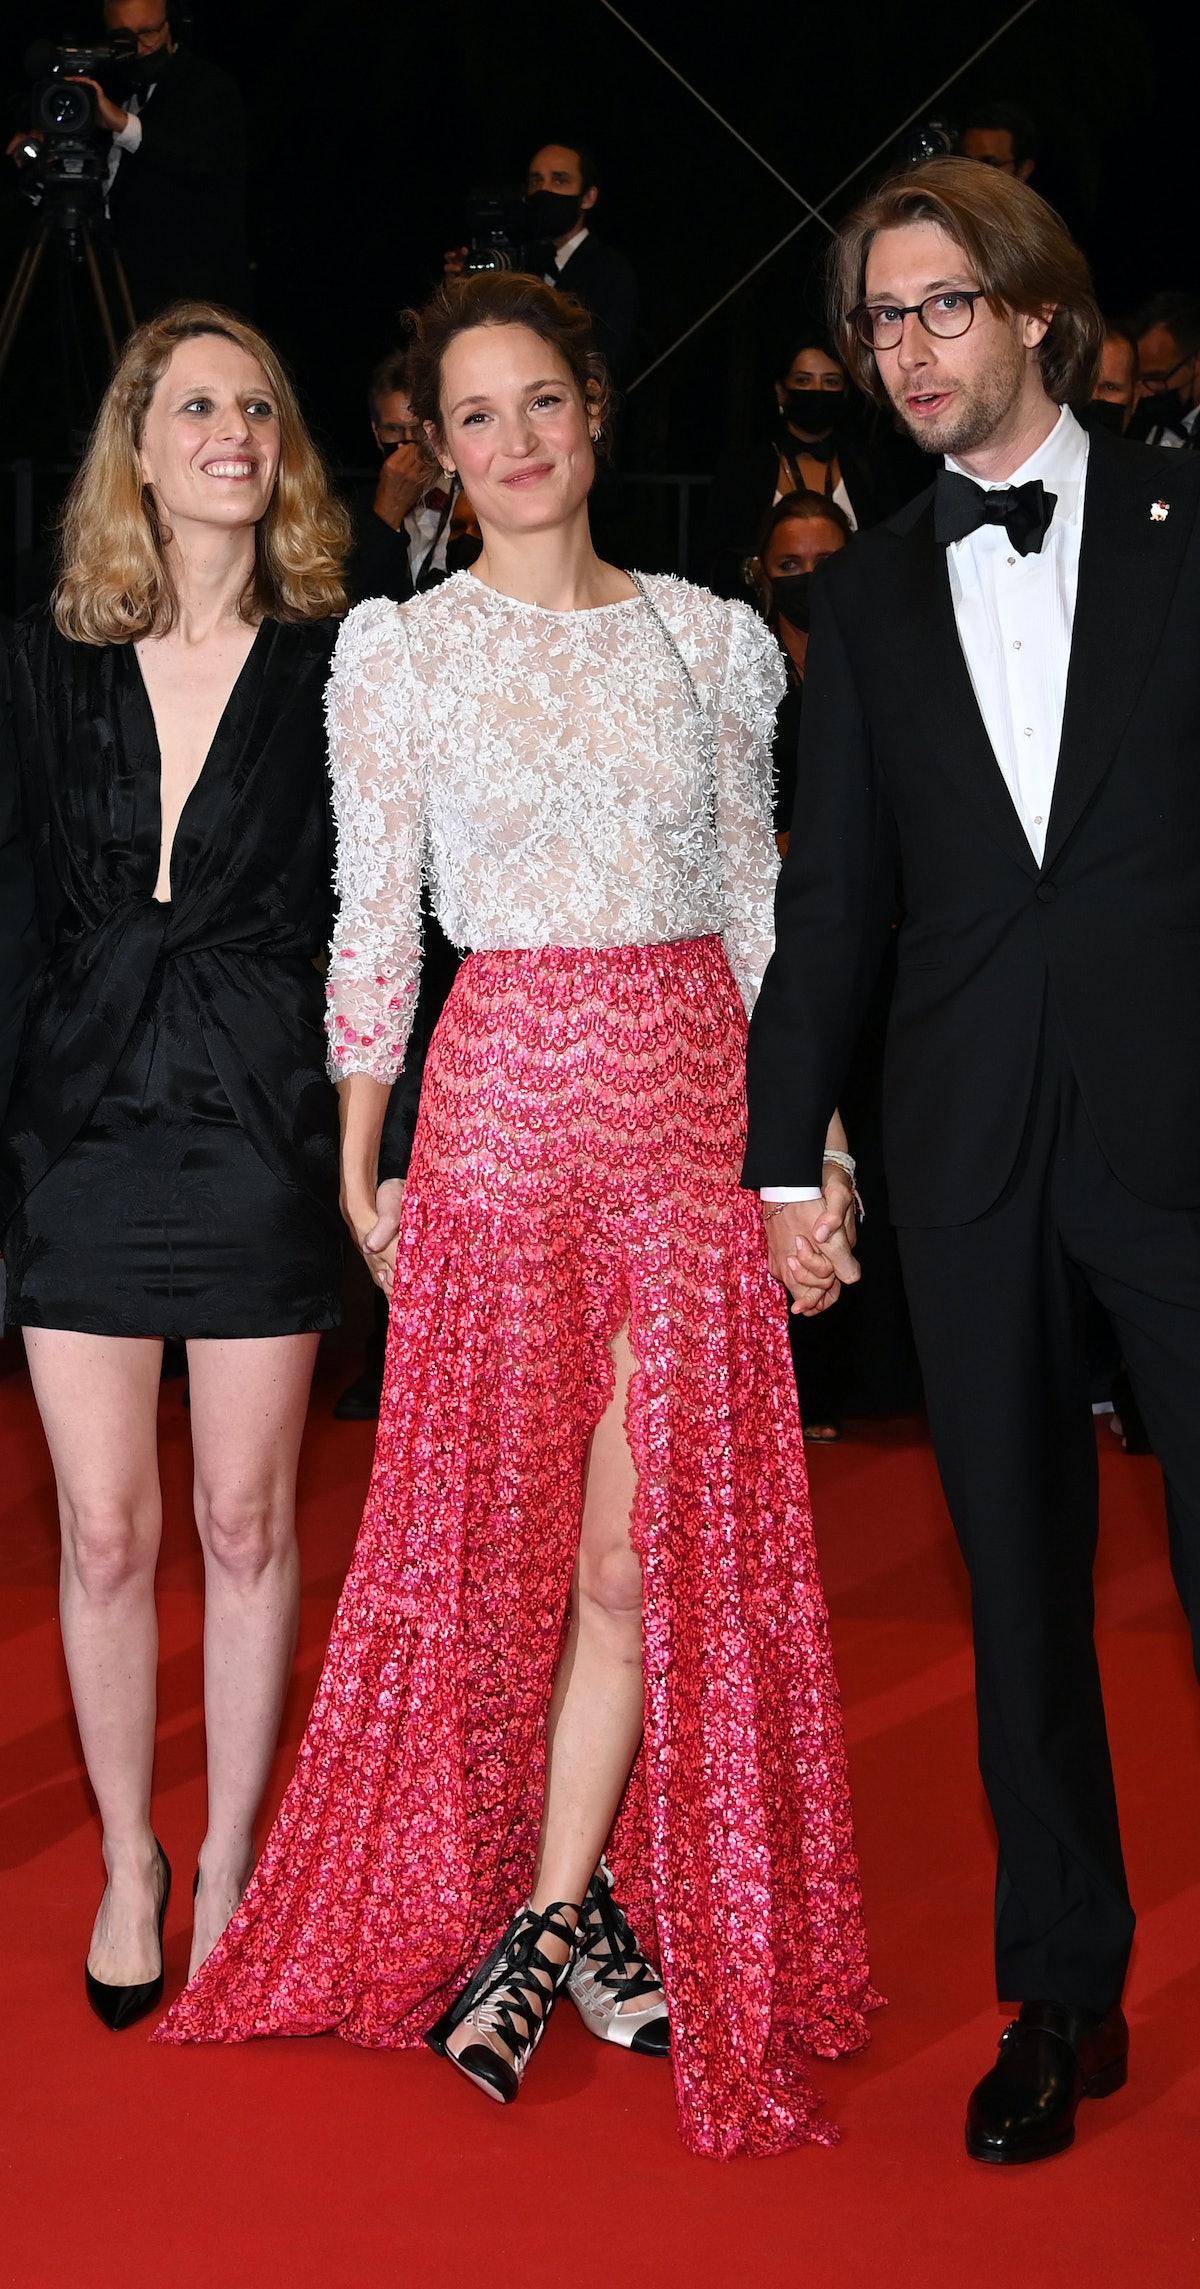 Mia Hansen-Løve, Vicky Krieps and Hampus Nordenson on the carpet